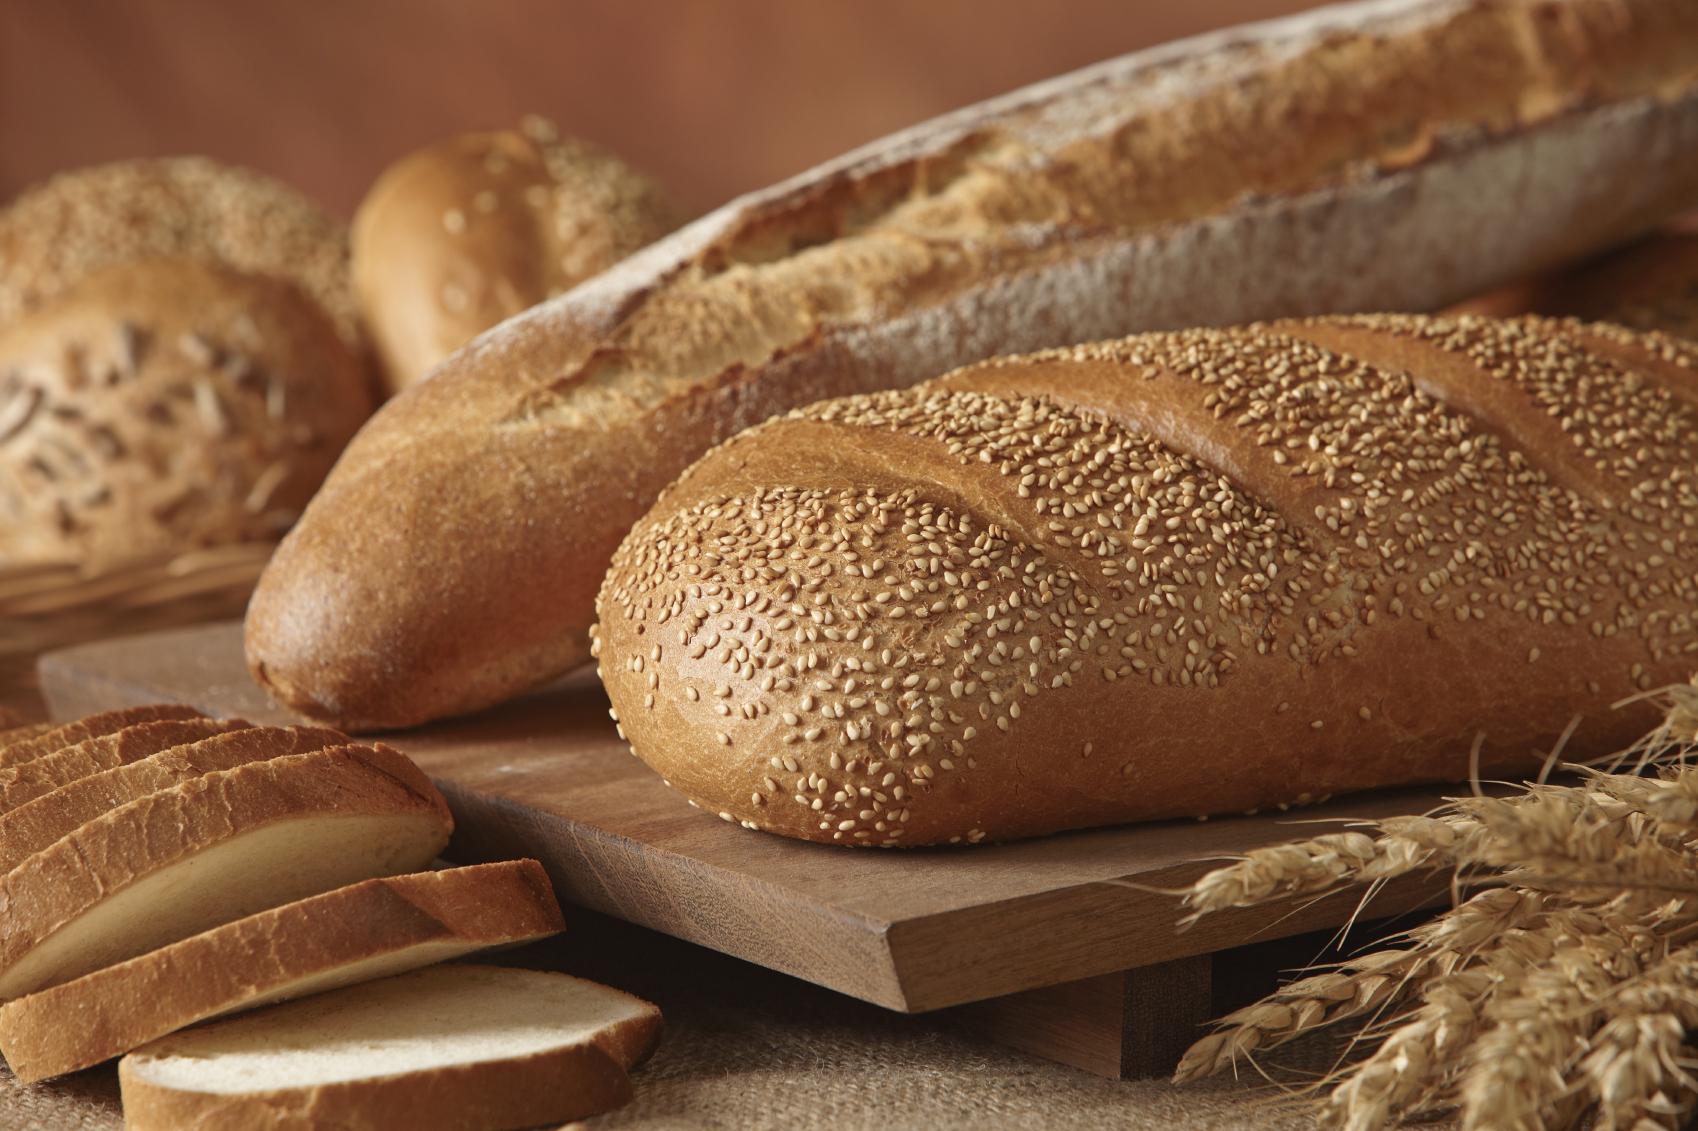 Nut bread rolls: Bziezen bil-ġewż